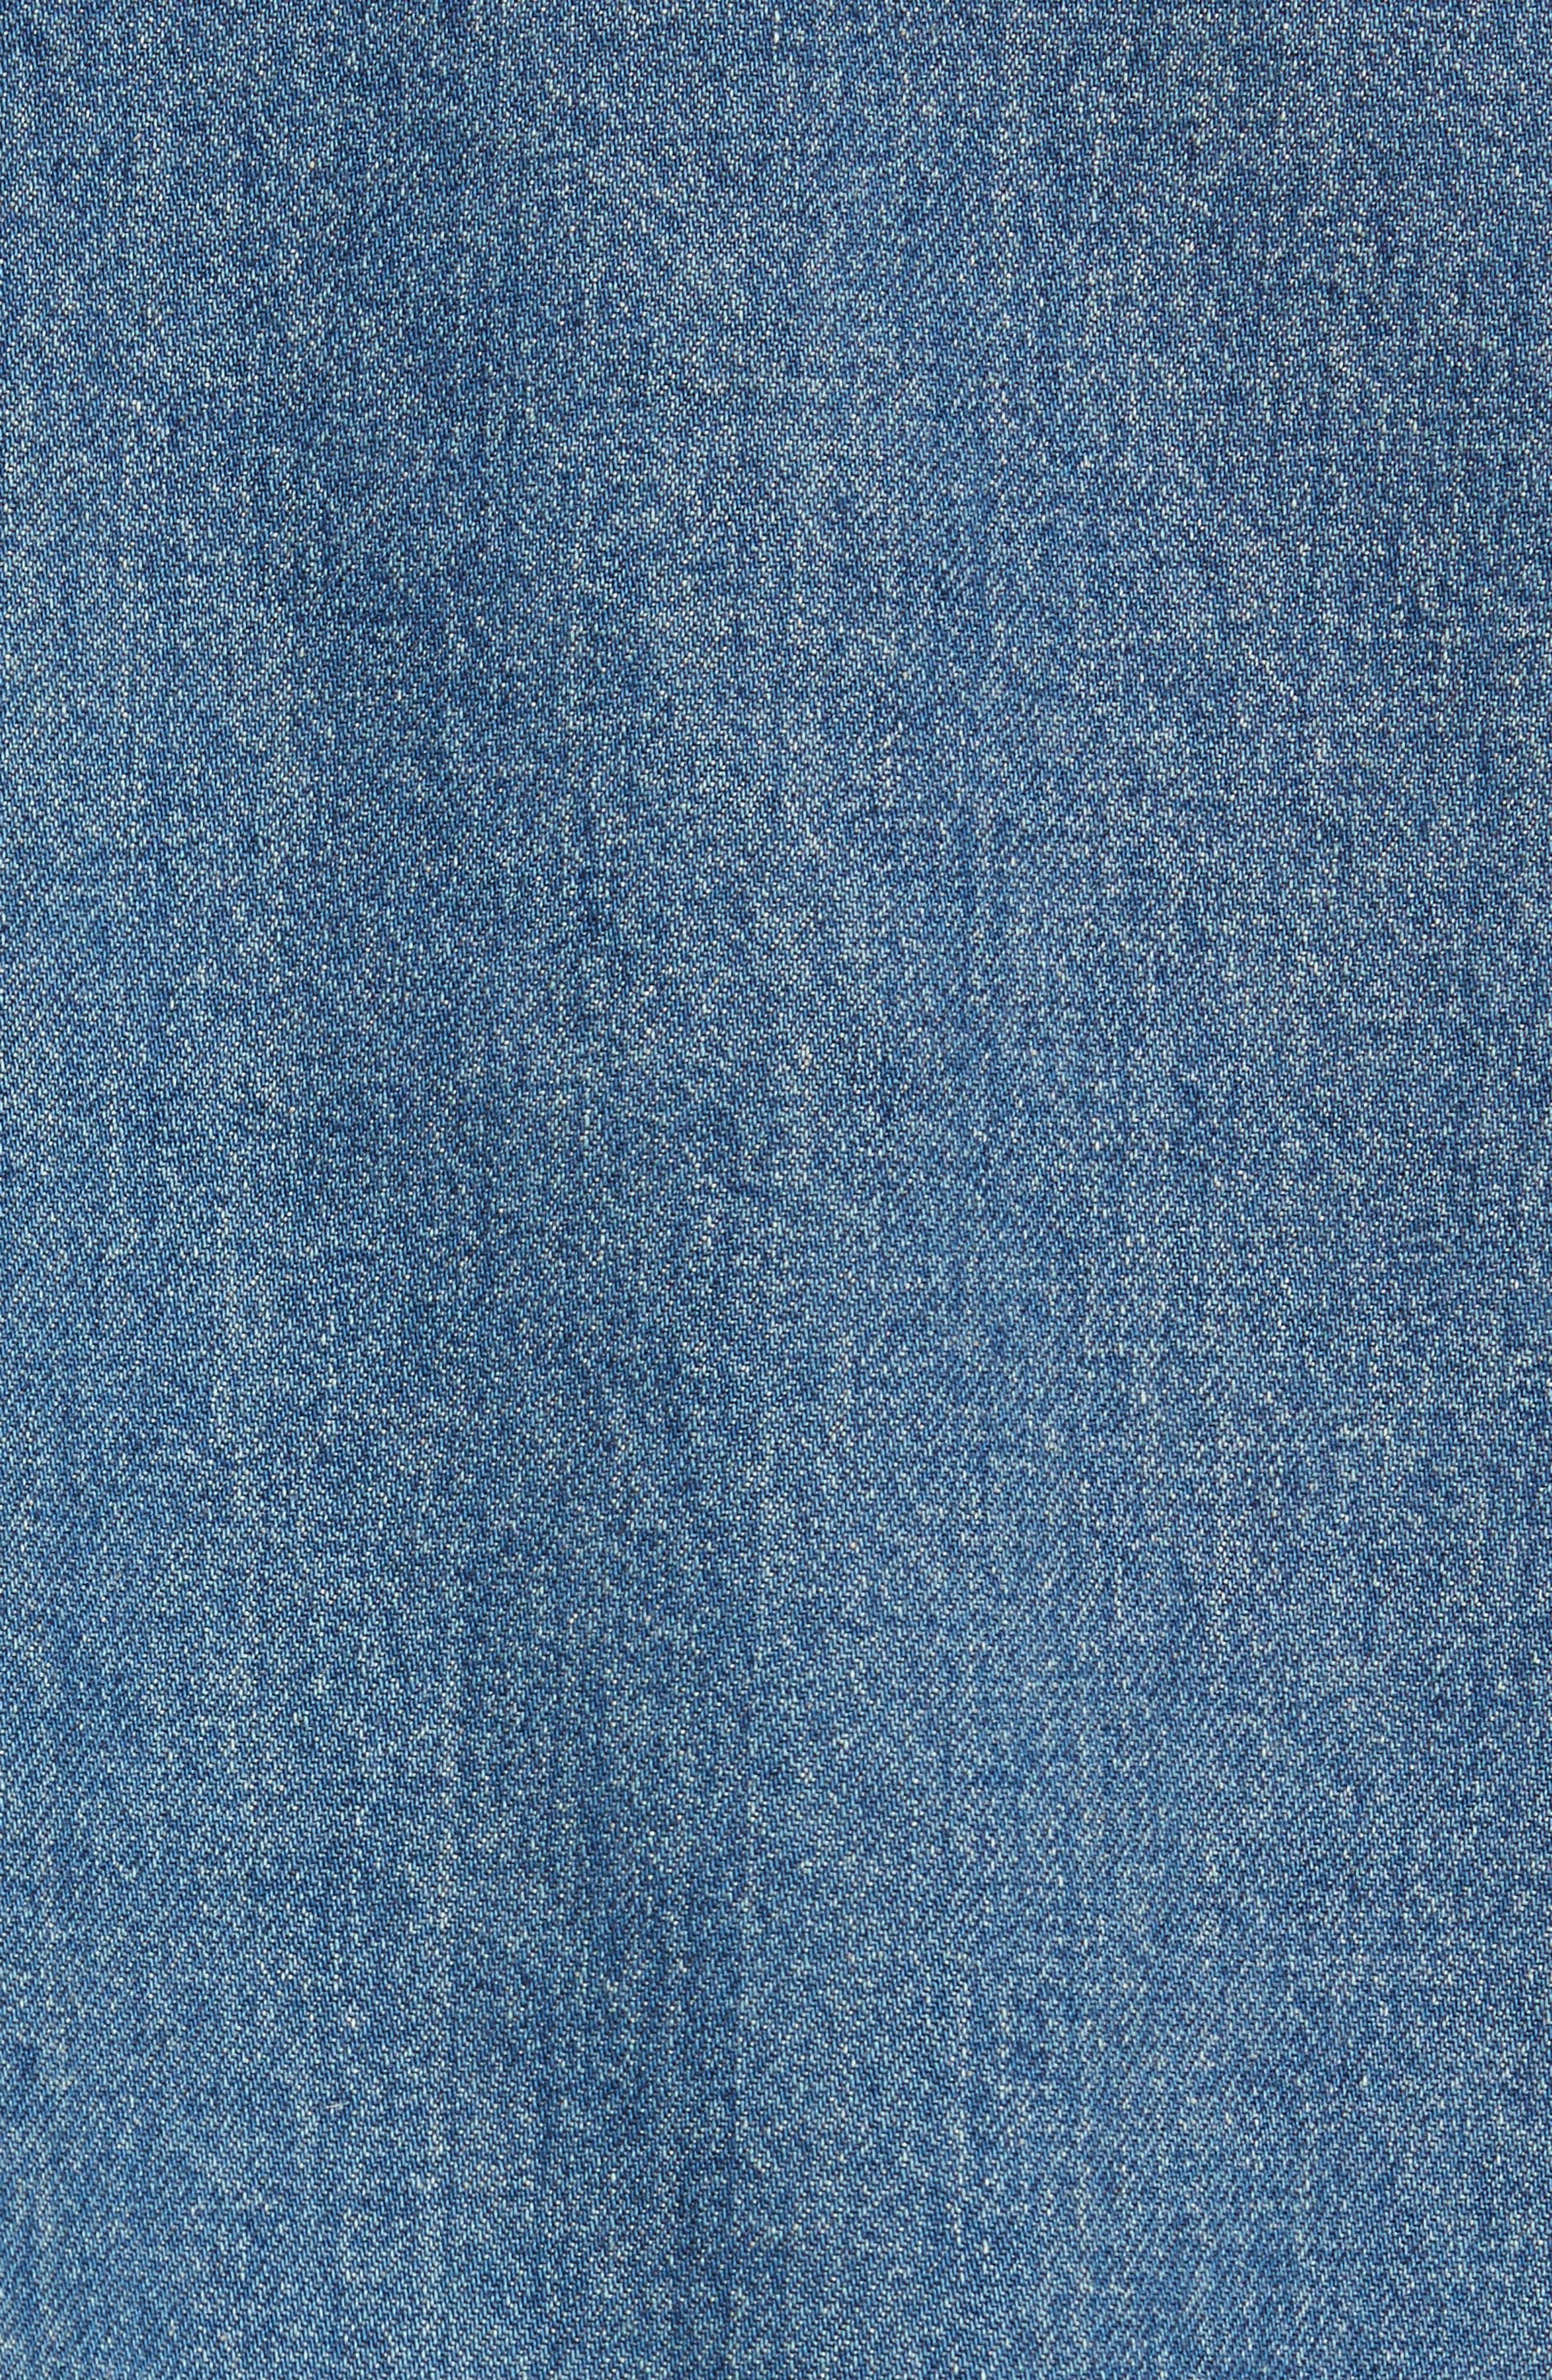 Smith Denim Jacket,                             Alternate thumbnail 5, color,                             Indigo Delave Ial